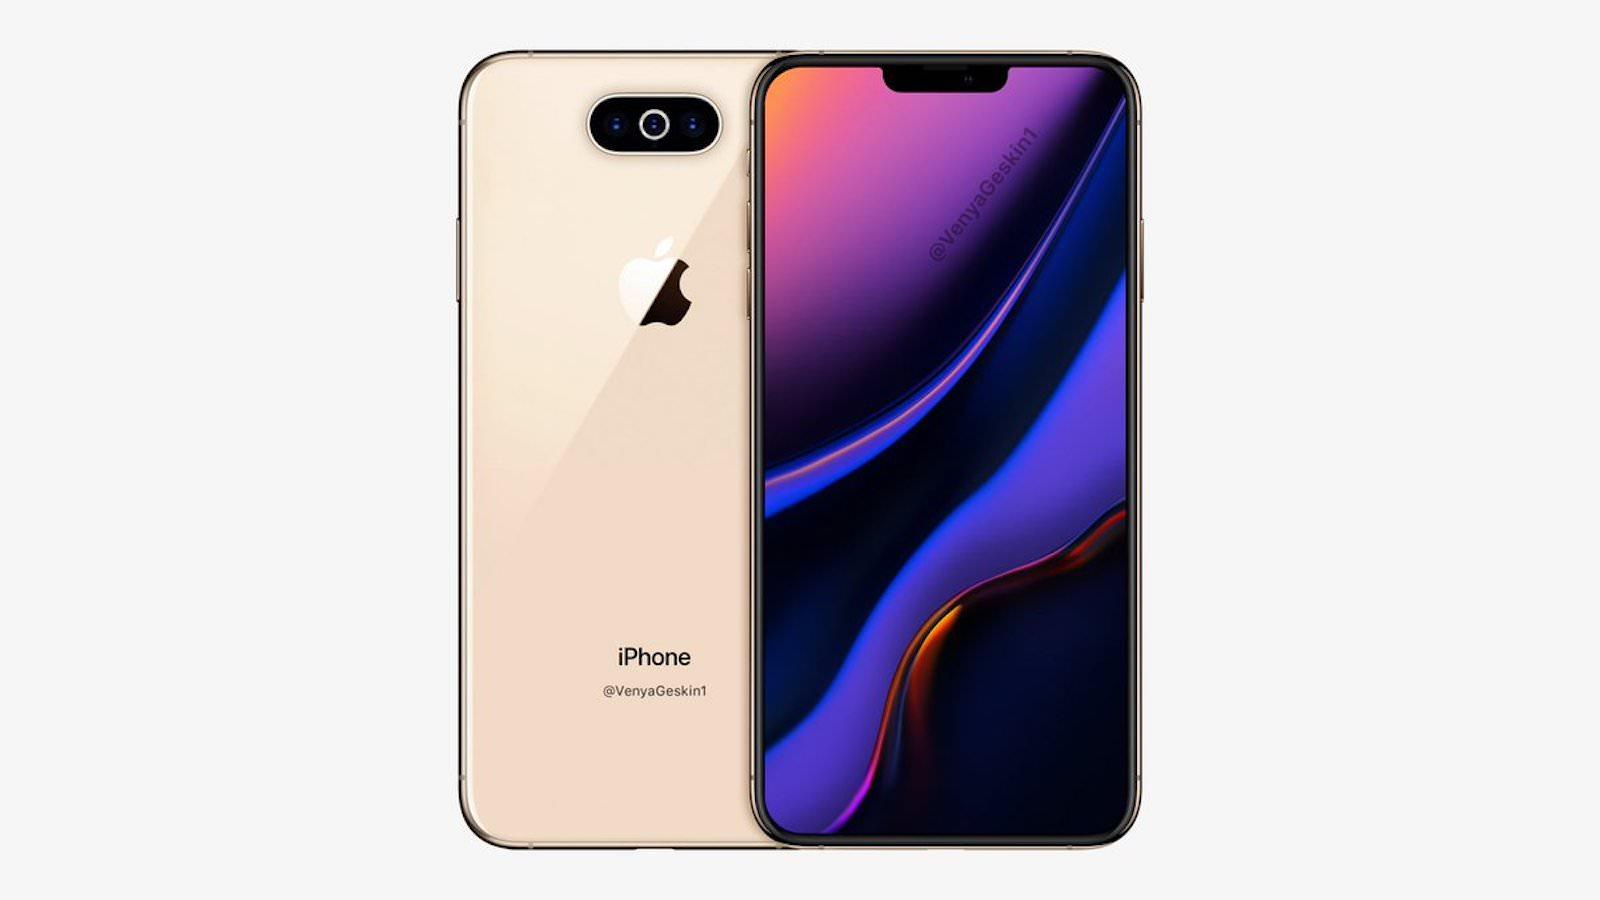 Next 2019 iphone model image